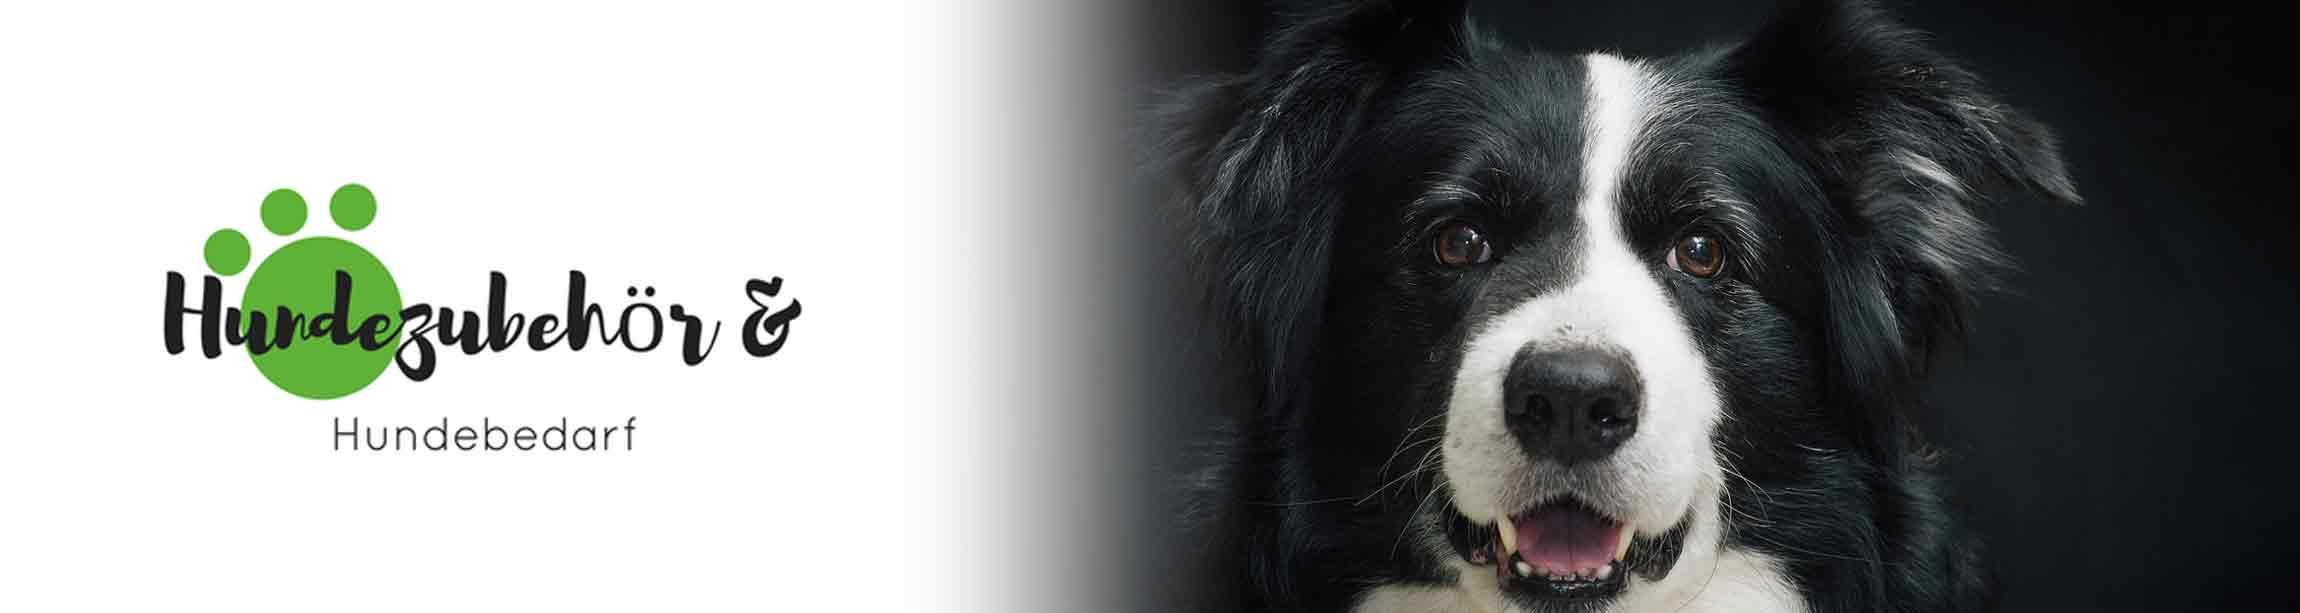 Hundezubehör Hundebedarf